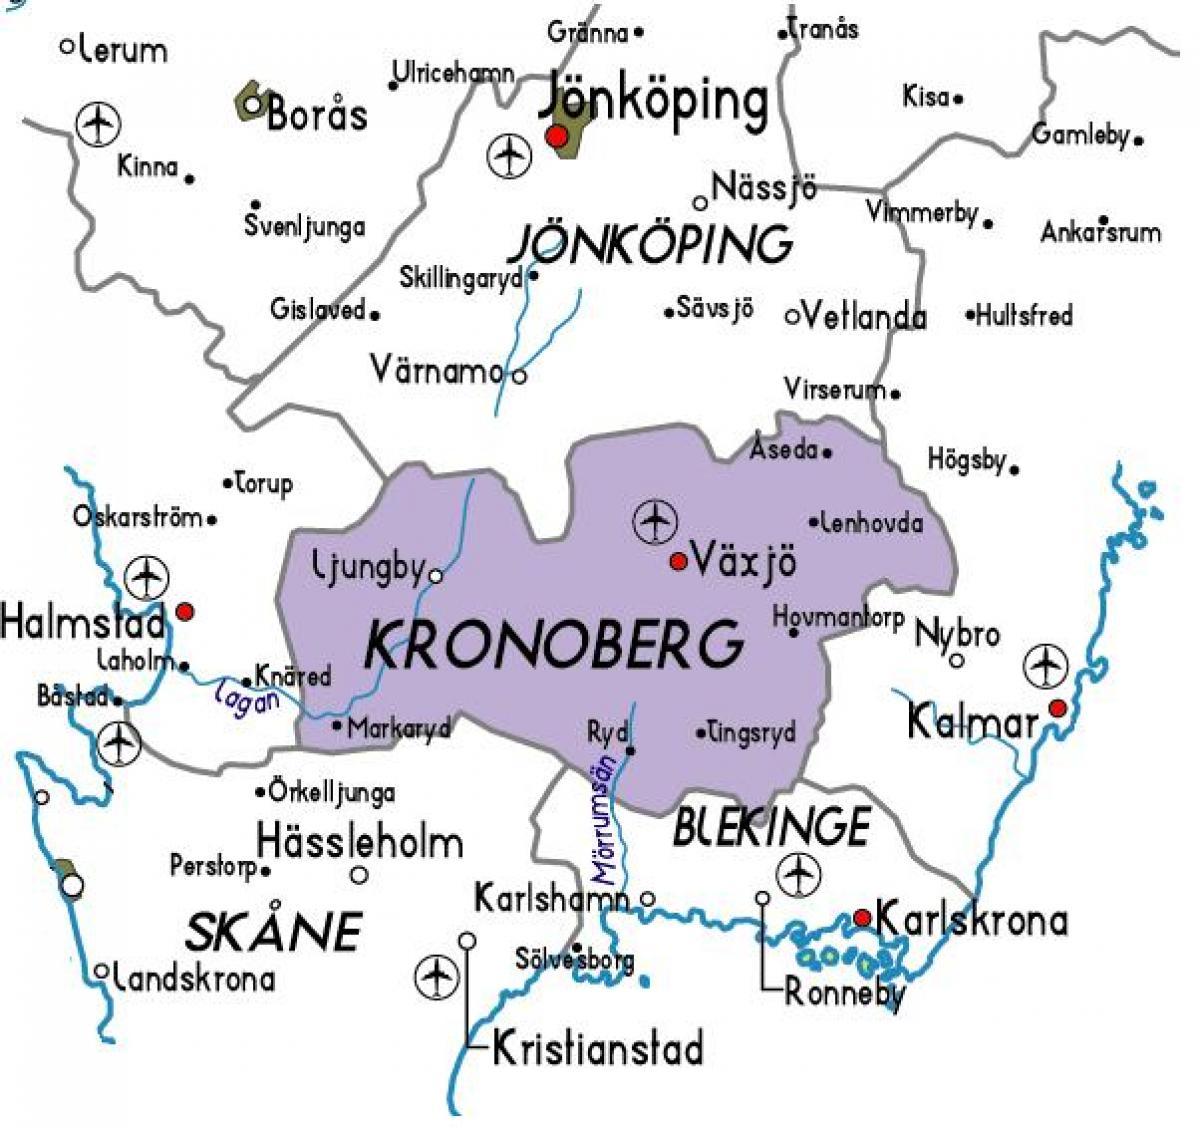 båstad sverige kart Kronoberg, Sverige kart   Kart over Kronoberg, Sverige (Nord  båstad sverige kart